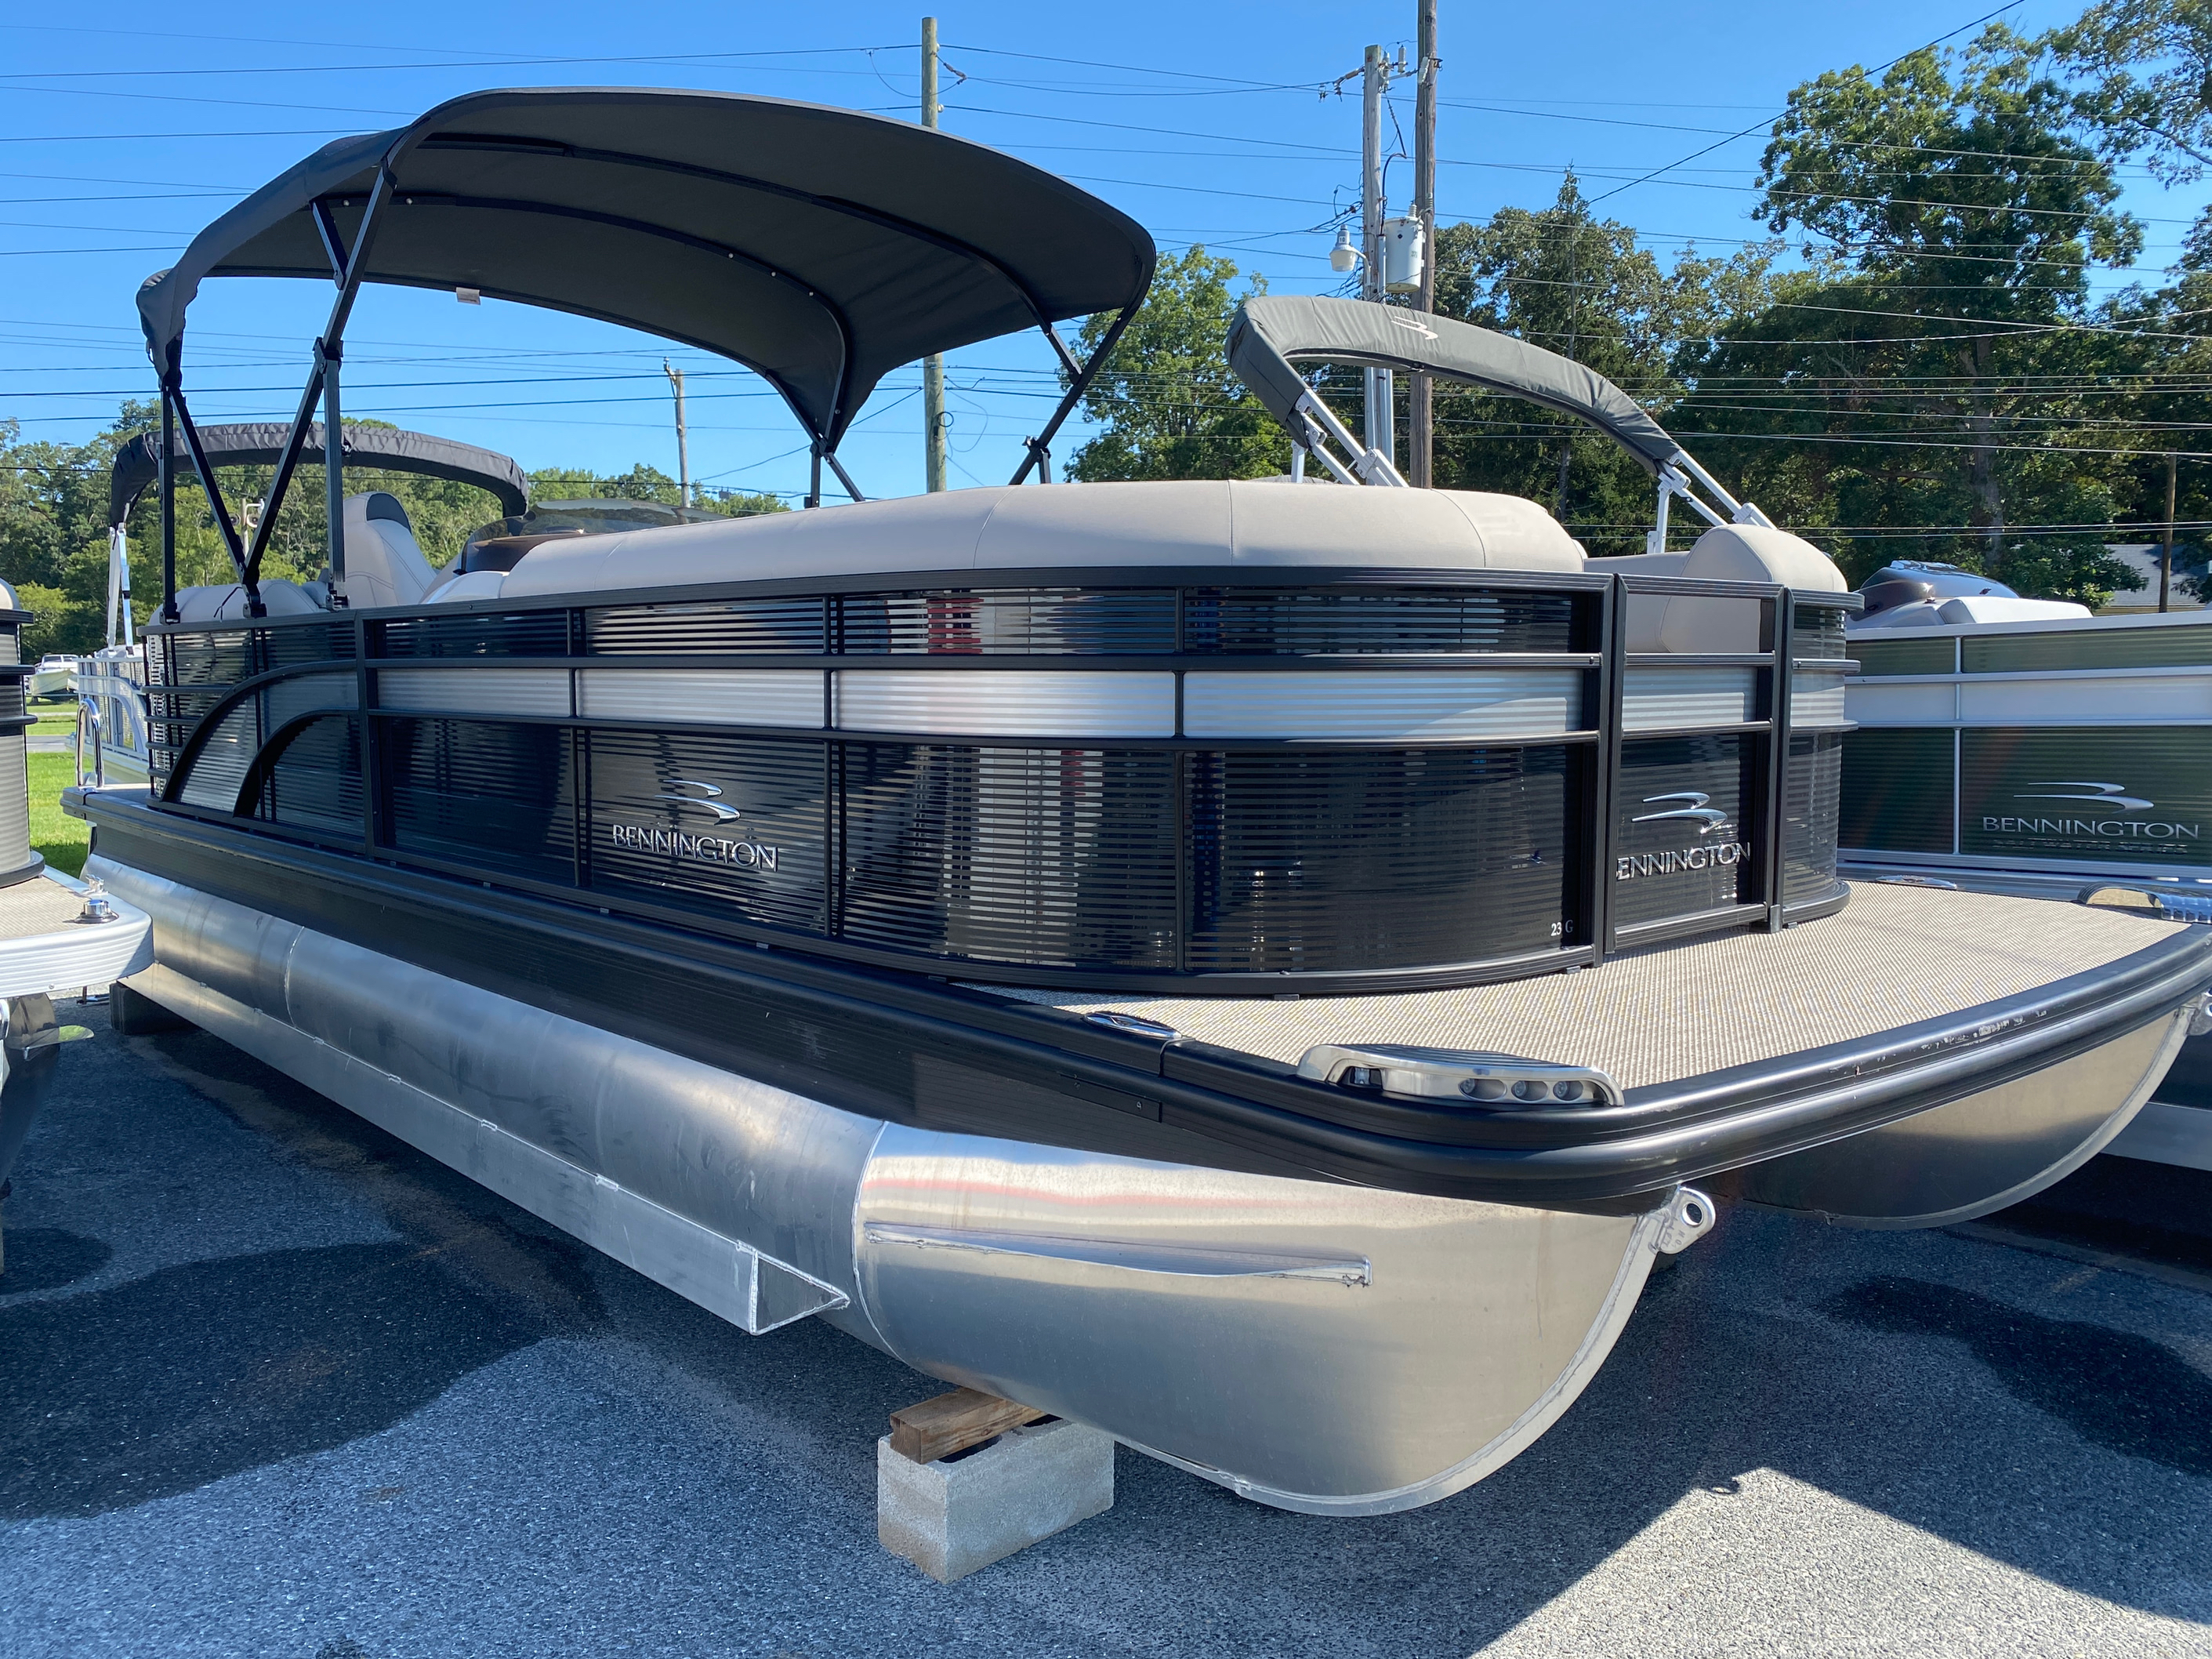 2019 Bennington boat for sale, model of the boat is 23 GSR & Image # 1 of 10